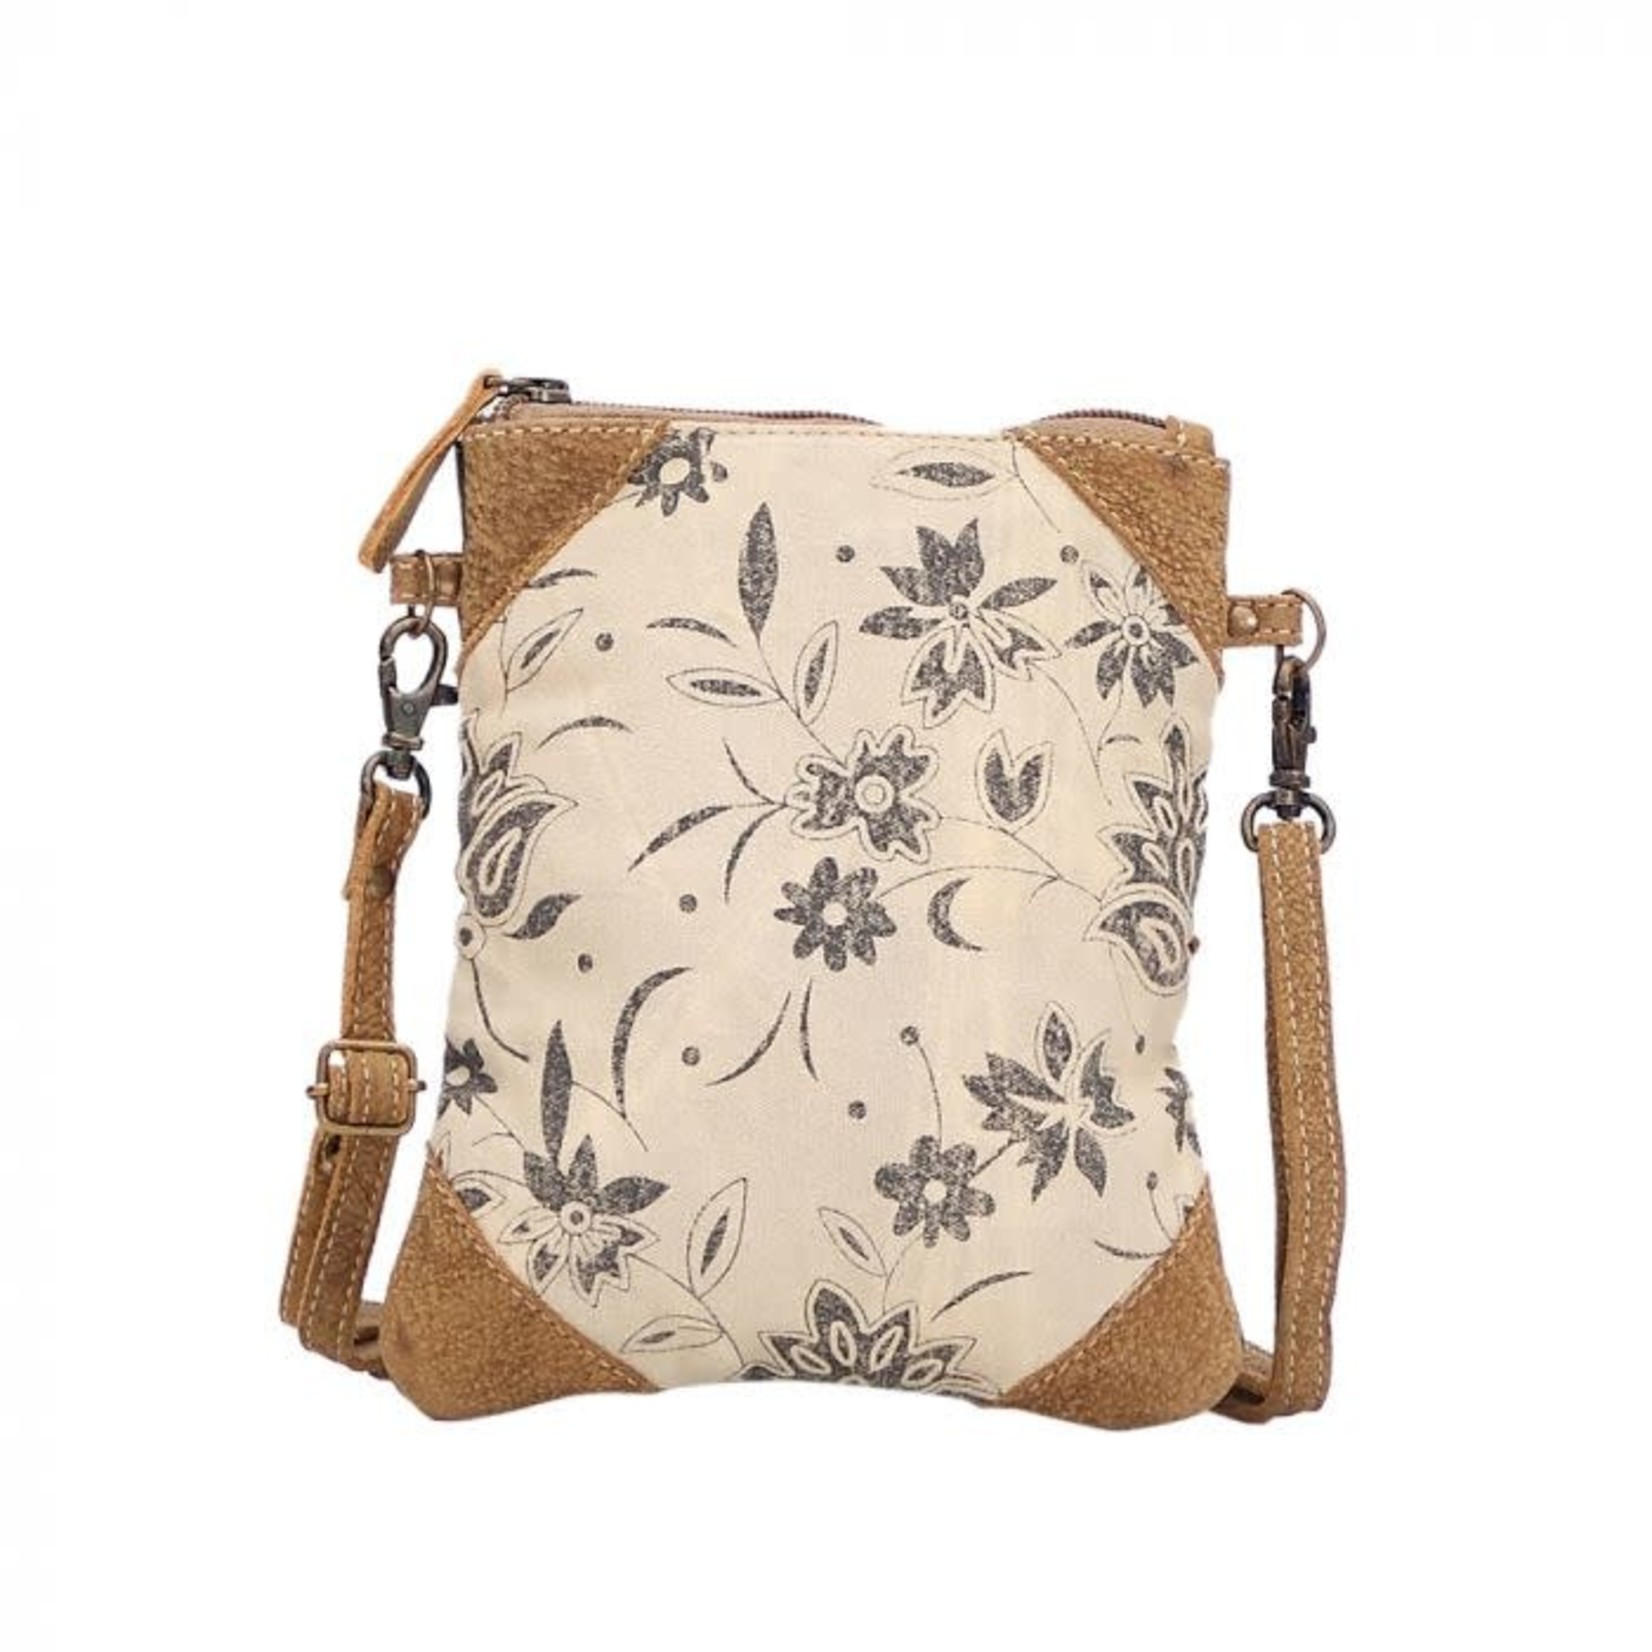 Myra Bag Flare Small Crossbody Bag